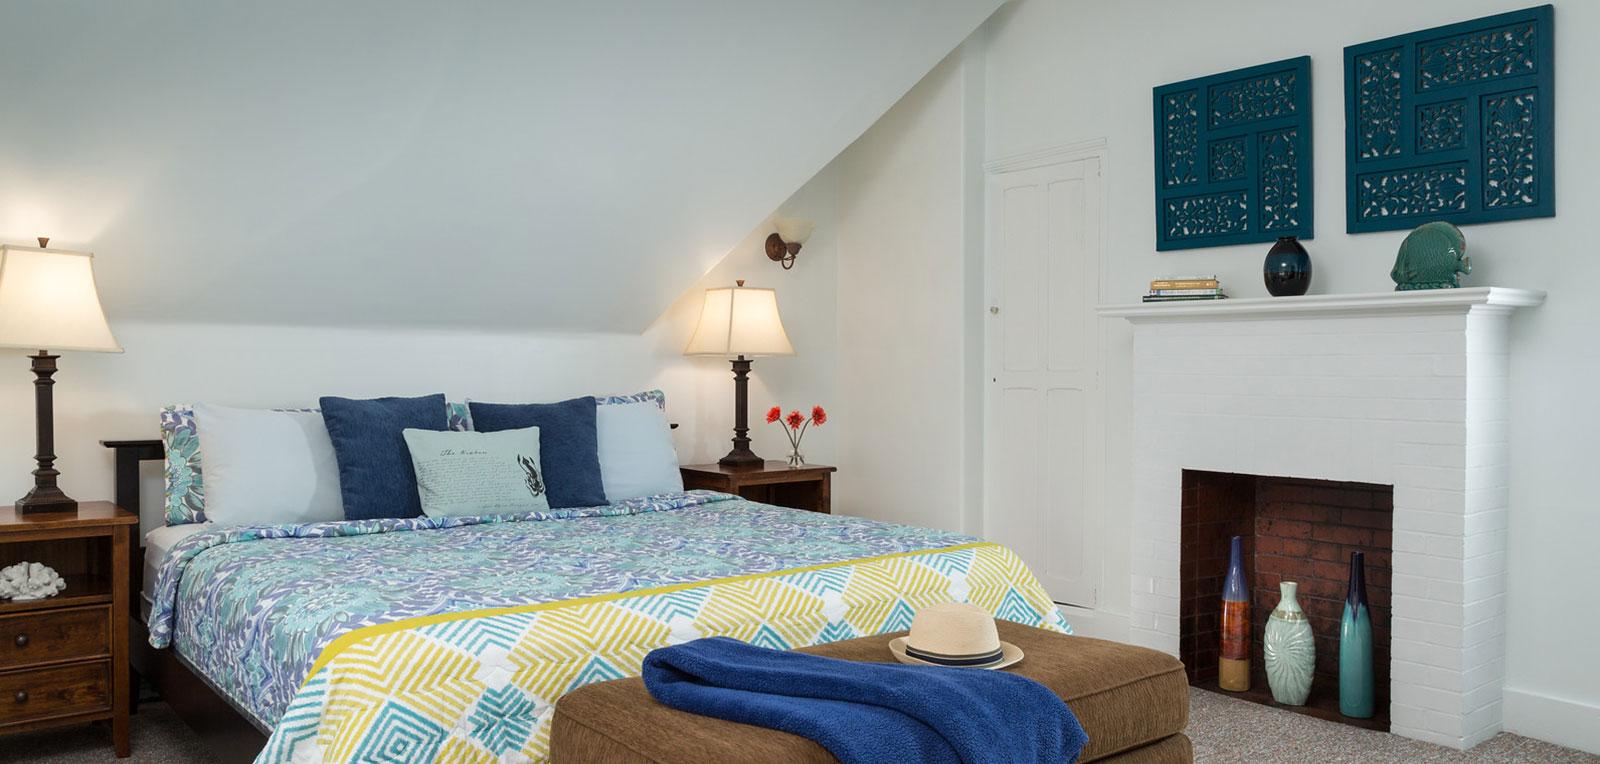 Admiral Sims' Suite Bedroom | ADMIRAL SIMS B&B, Newport Rhode Island